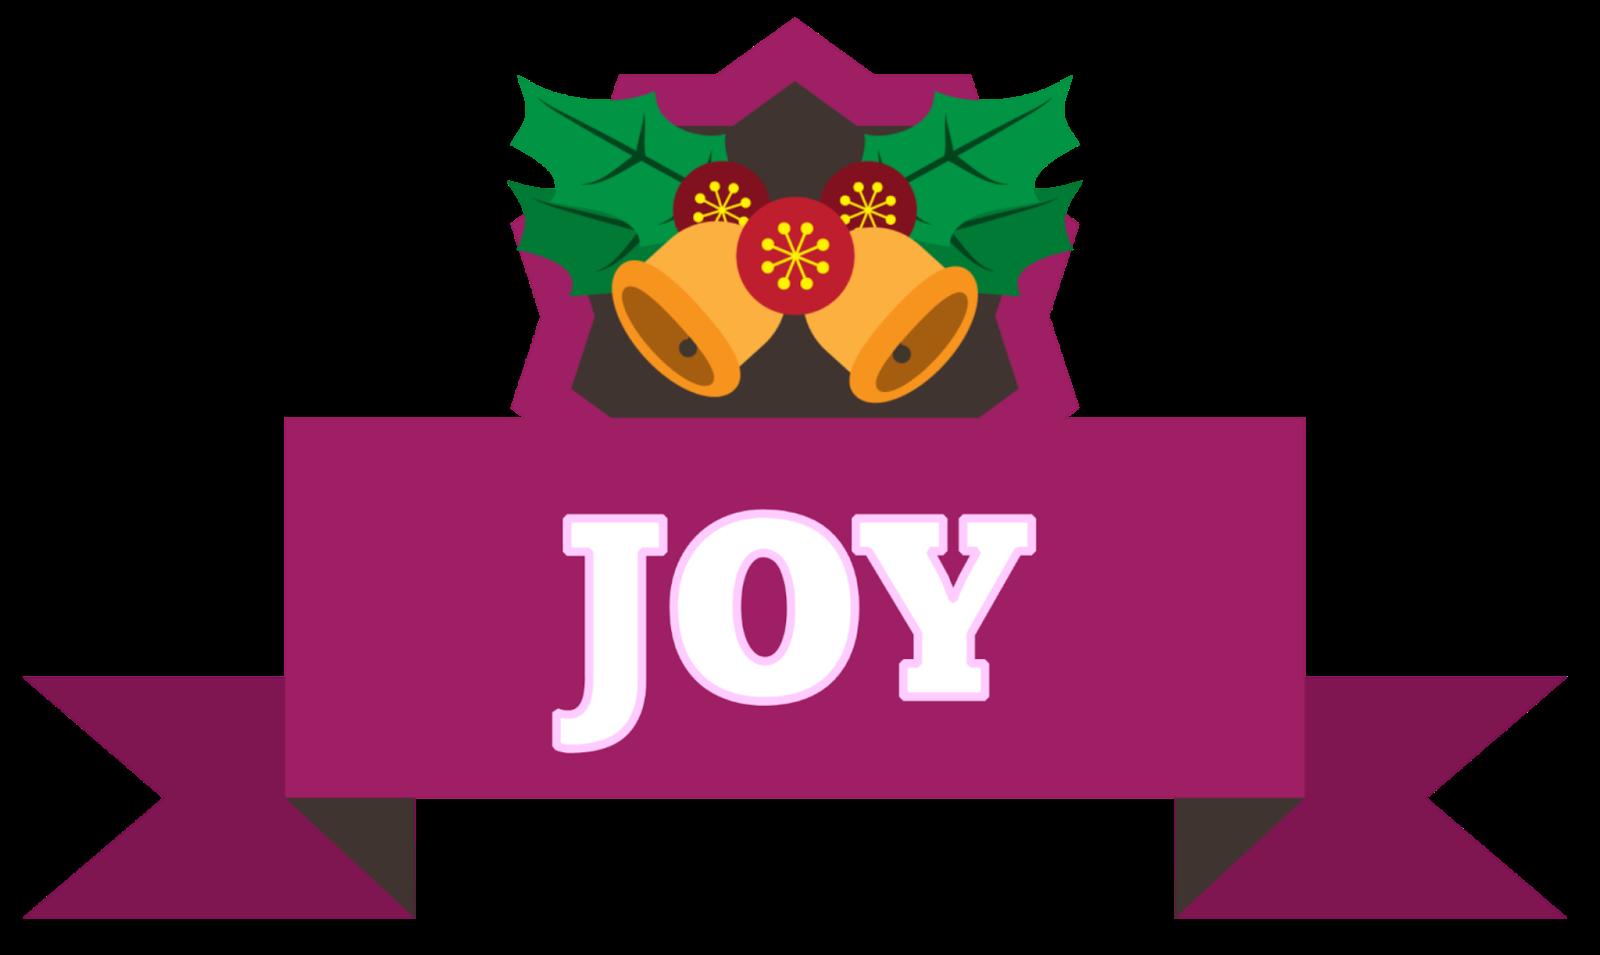 Excited clipart joyfulness. Chelsea everywhere december creating